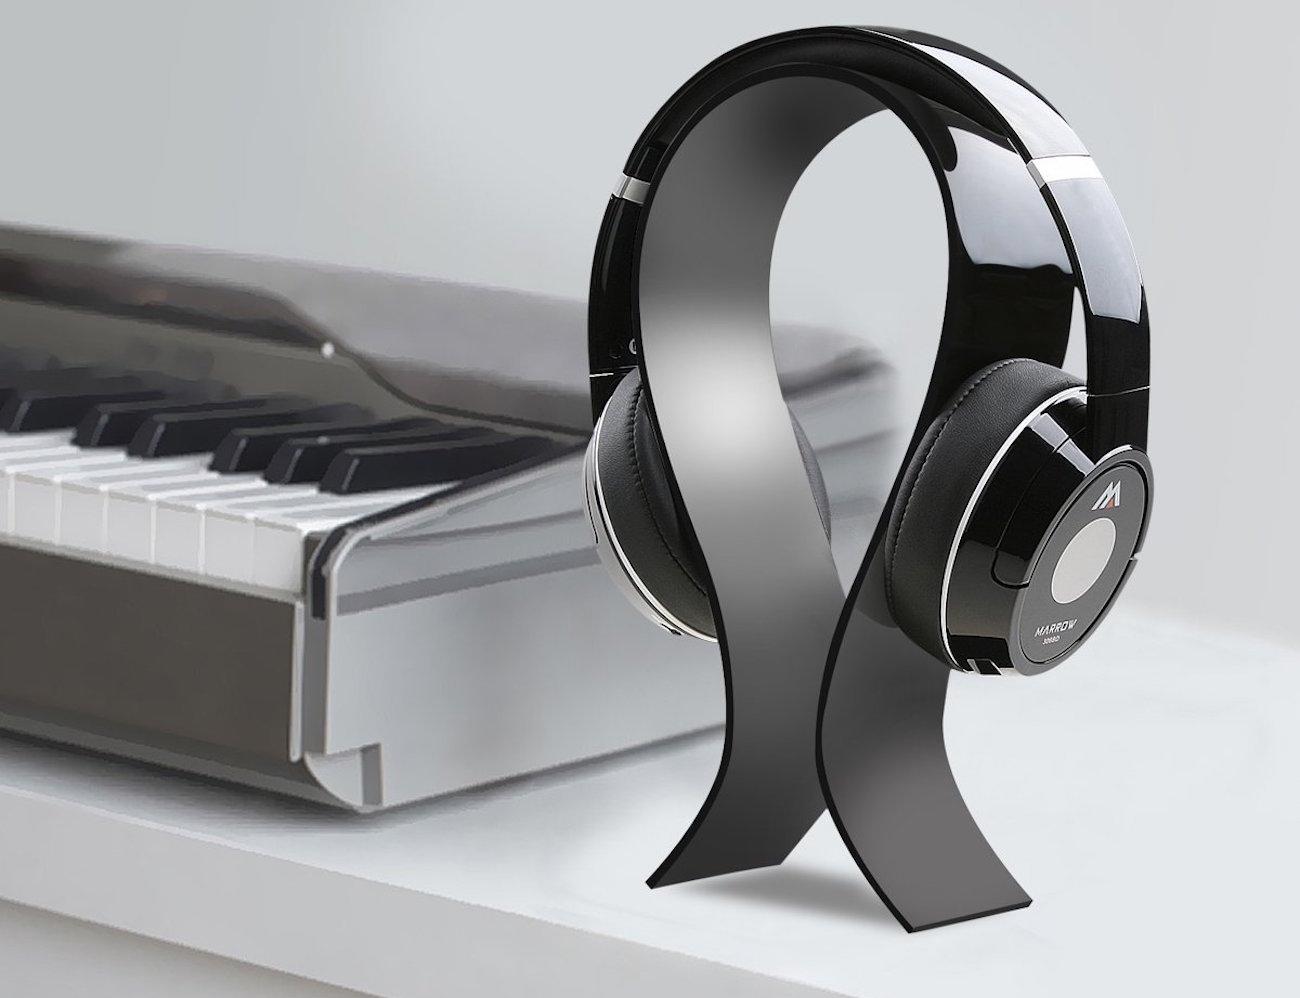 Omega Acrylic Headphone Stand by AmoVee